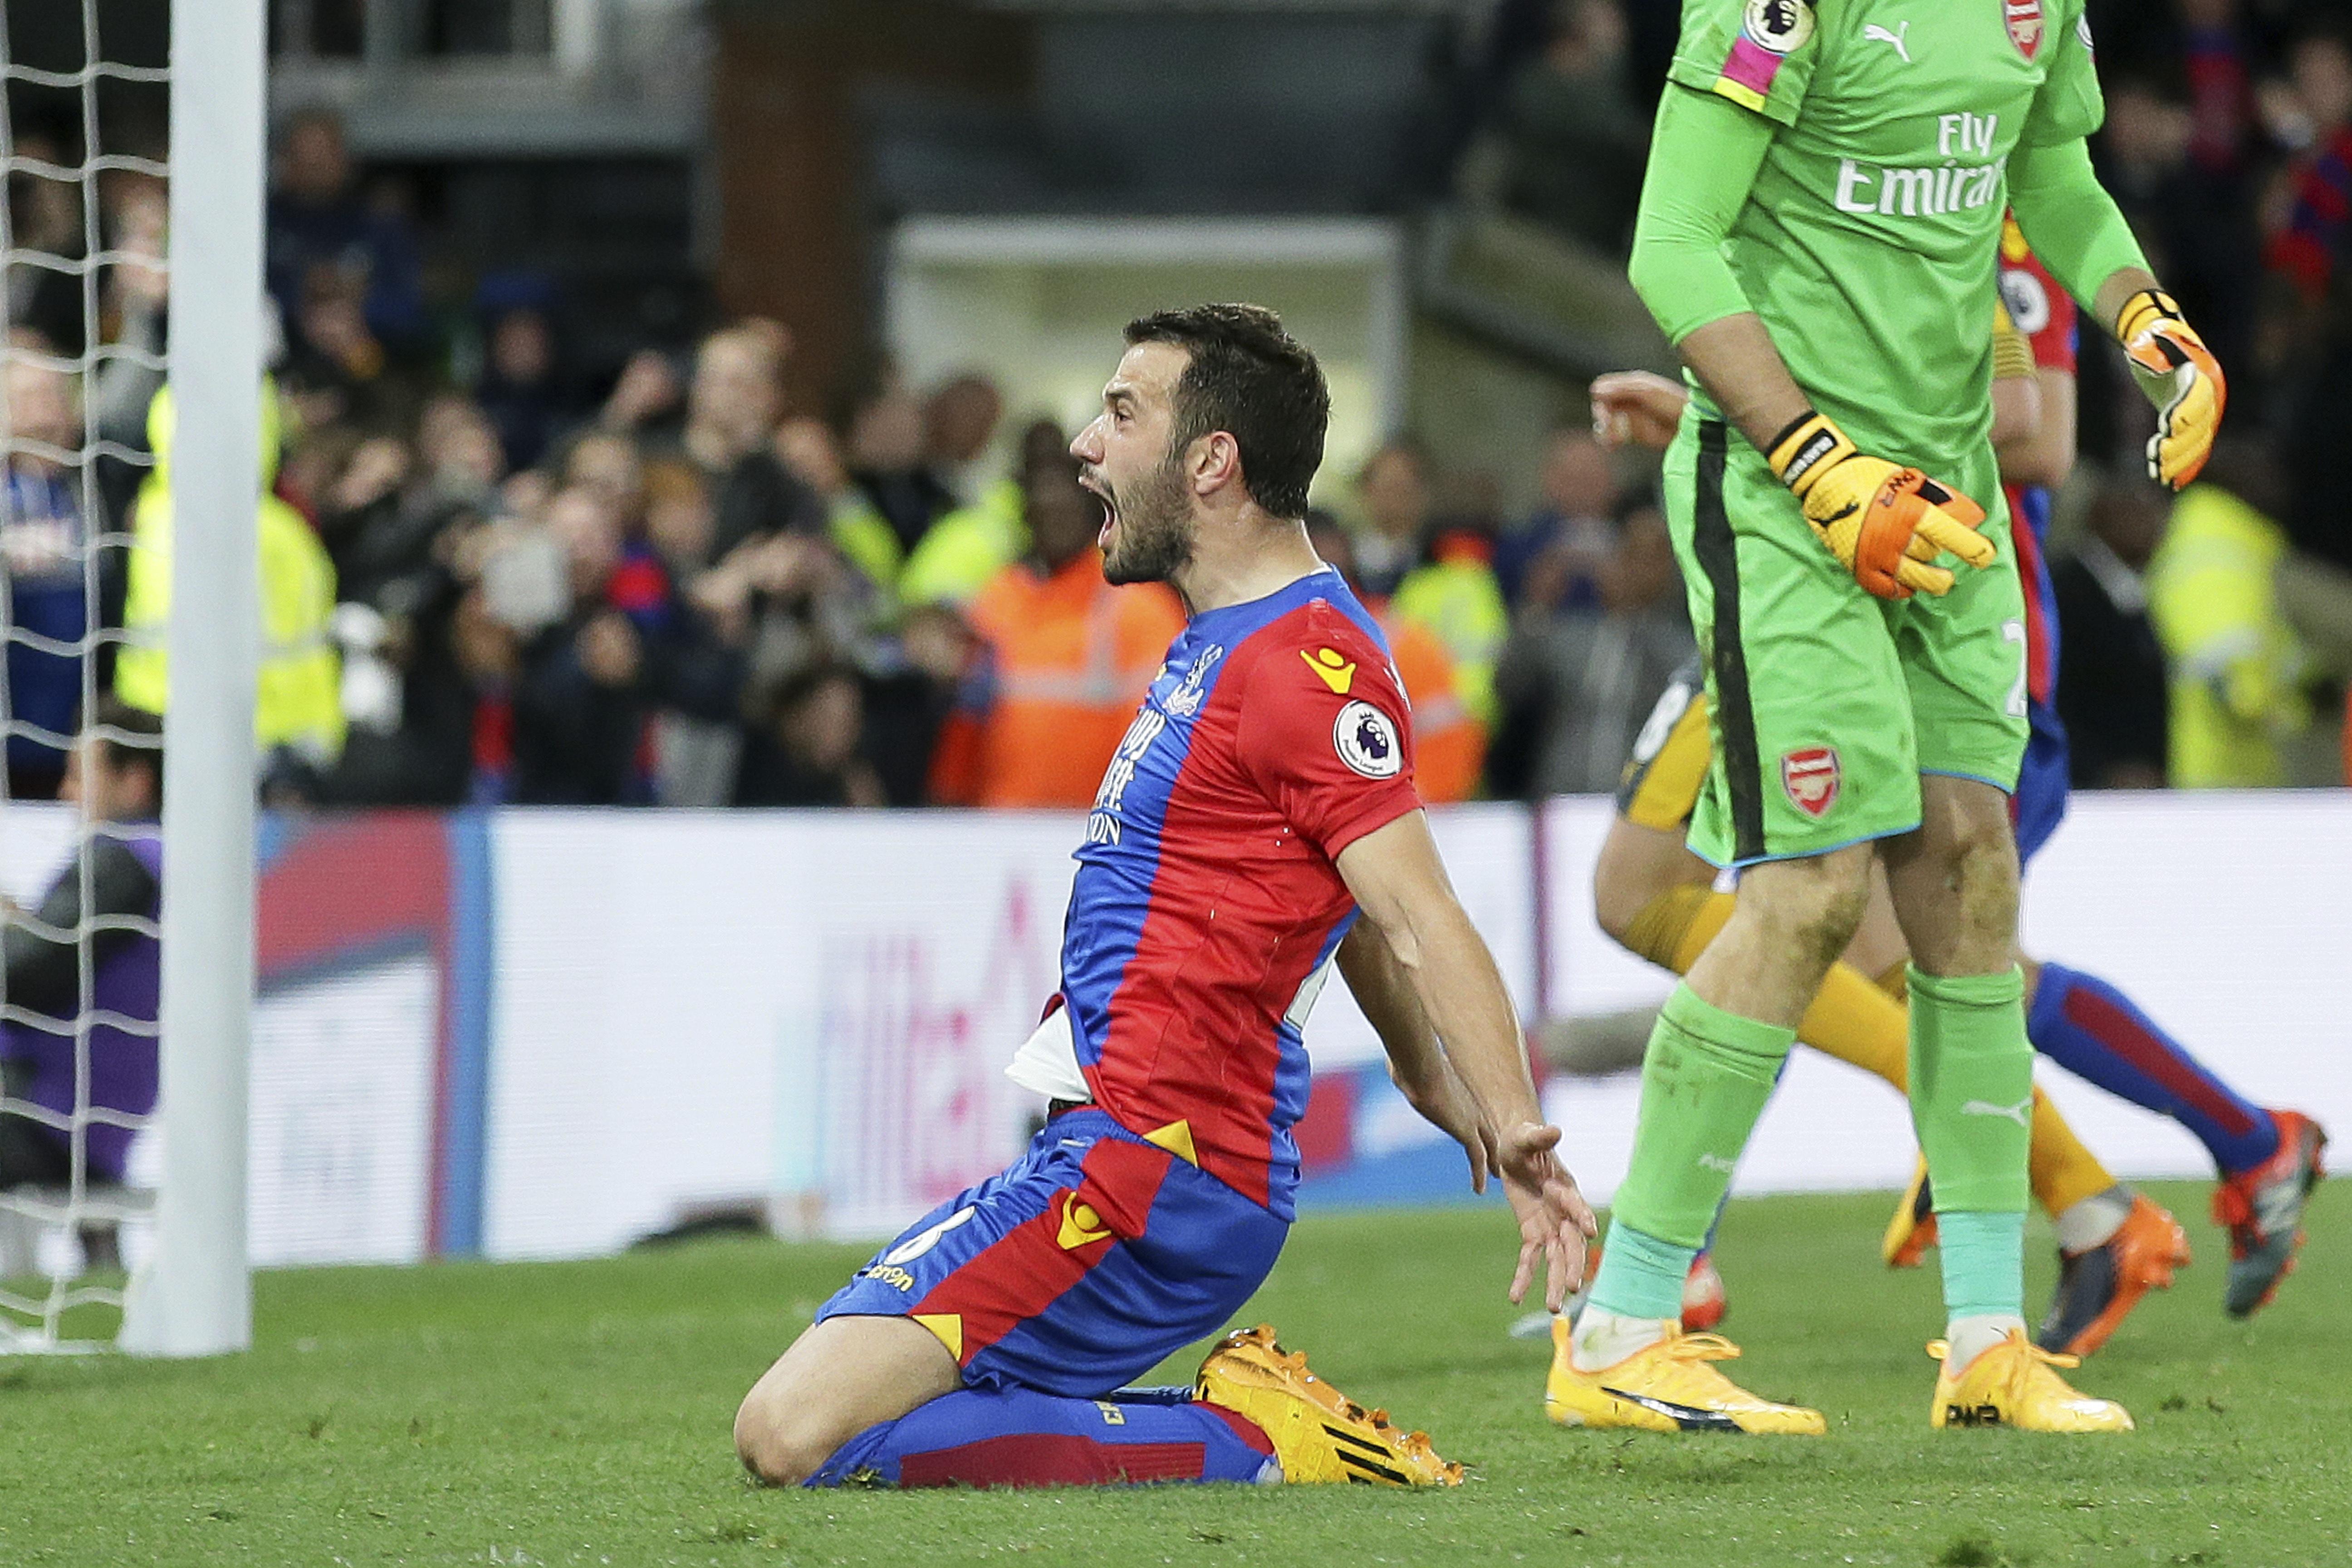 Crystal Palace: Palace win delights Milivojevic